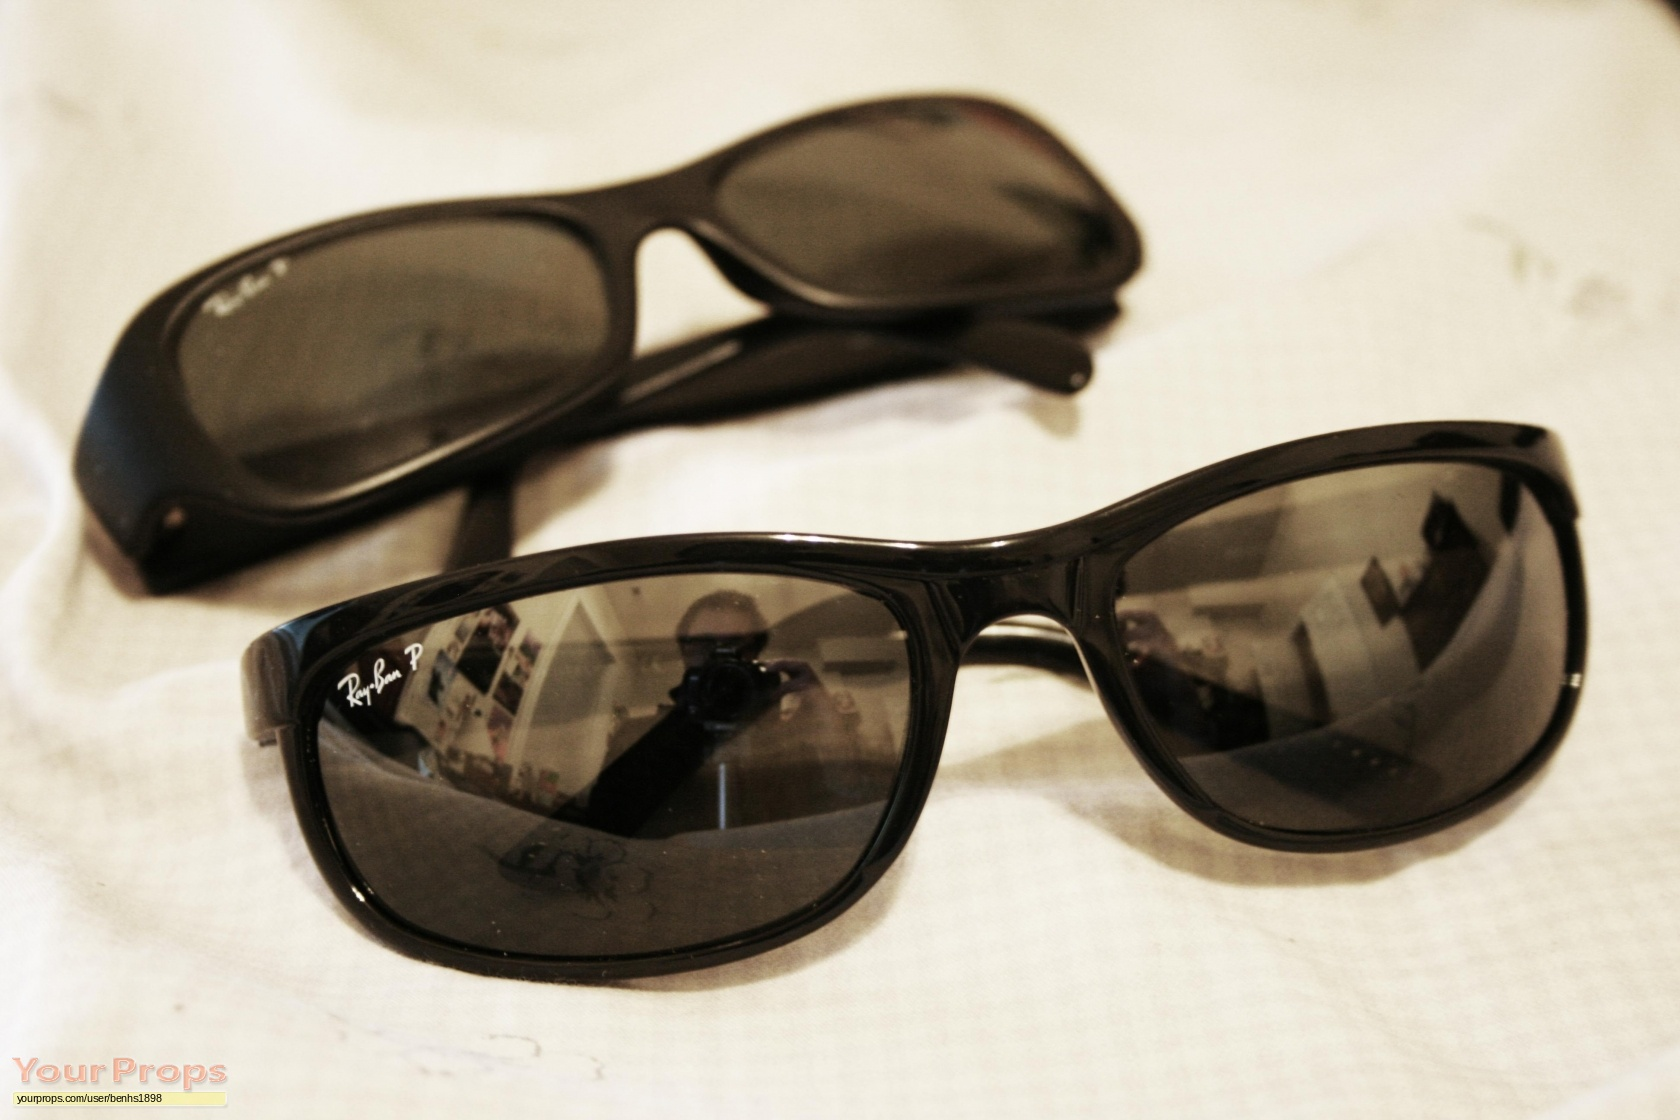 ray ban predator 2 sunglasses review